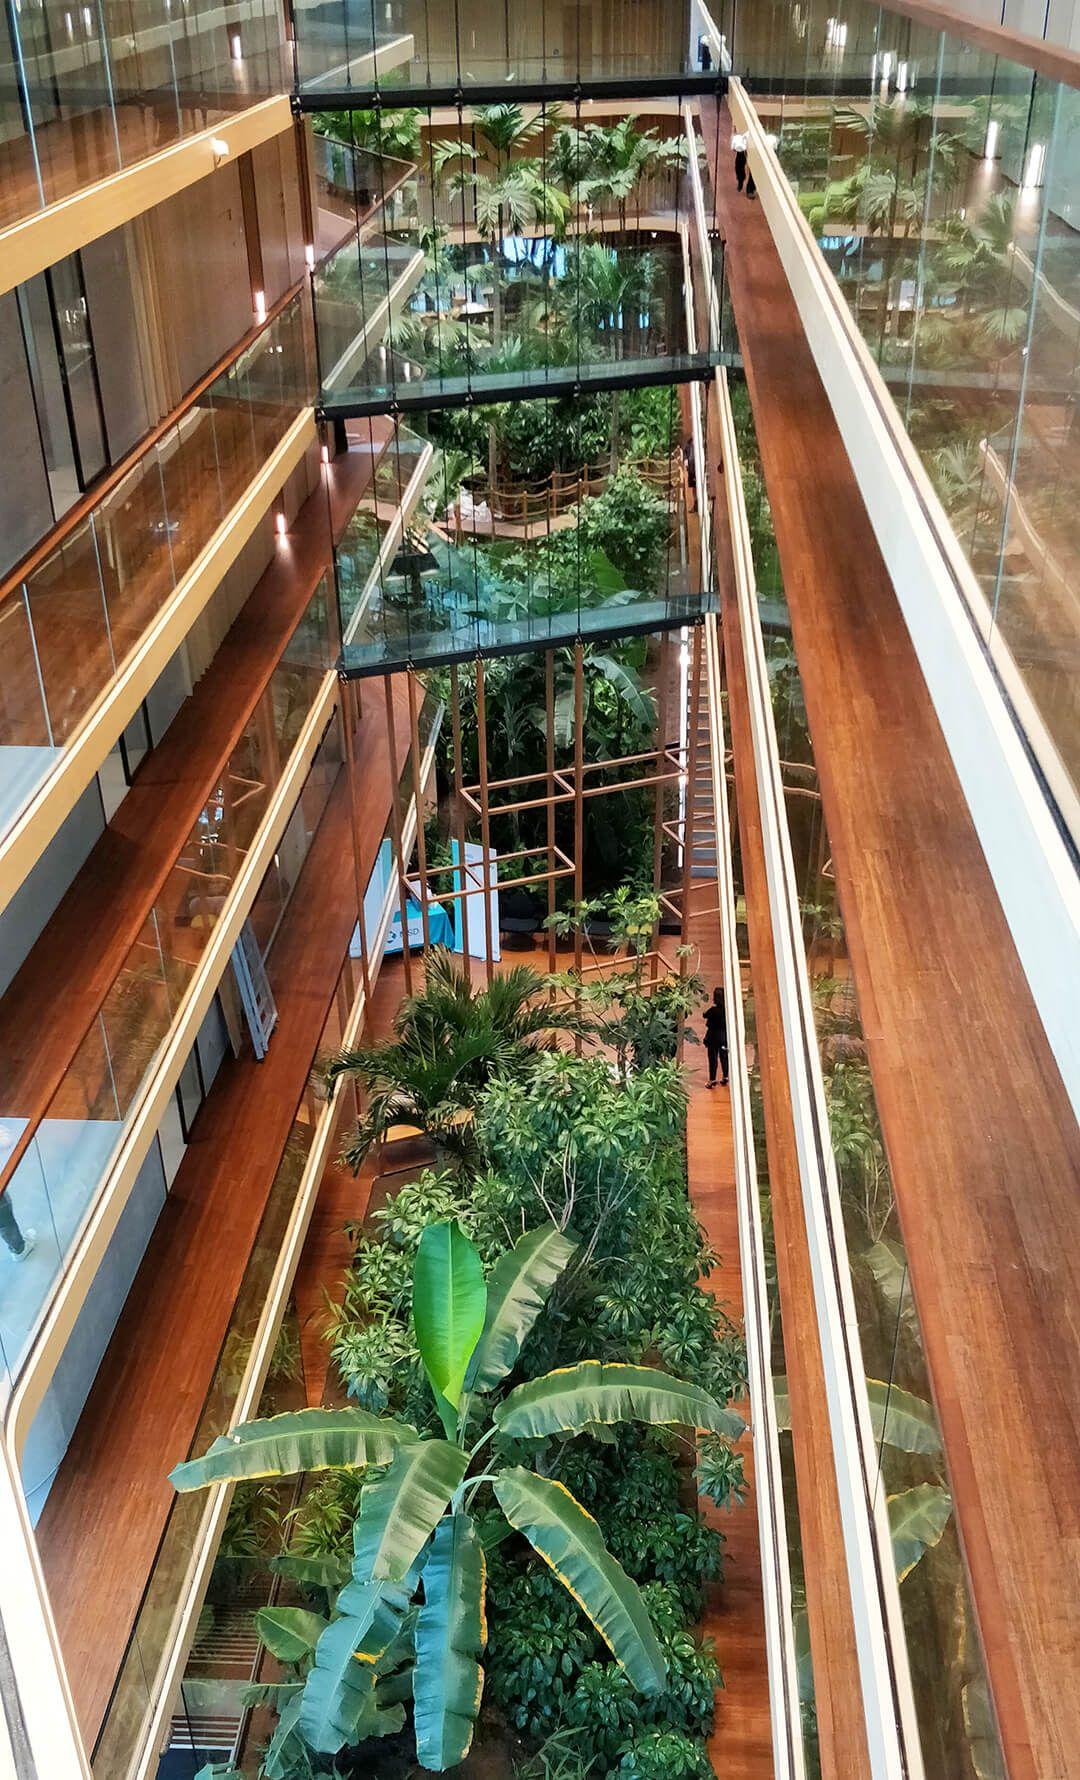 In Amsterdam A Java Island Hotel Goes Greener Hotel Architecture Green Architecture Amsterdam Hotel